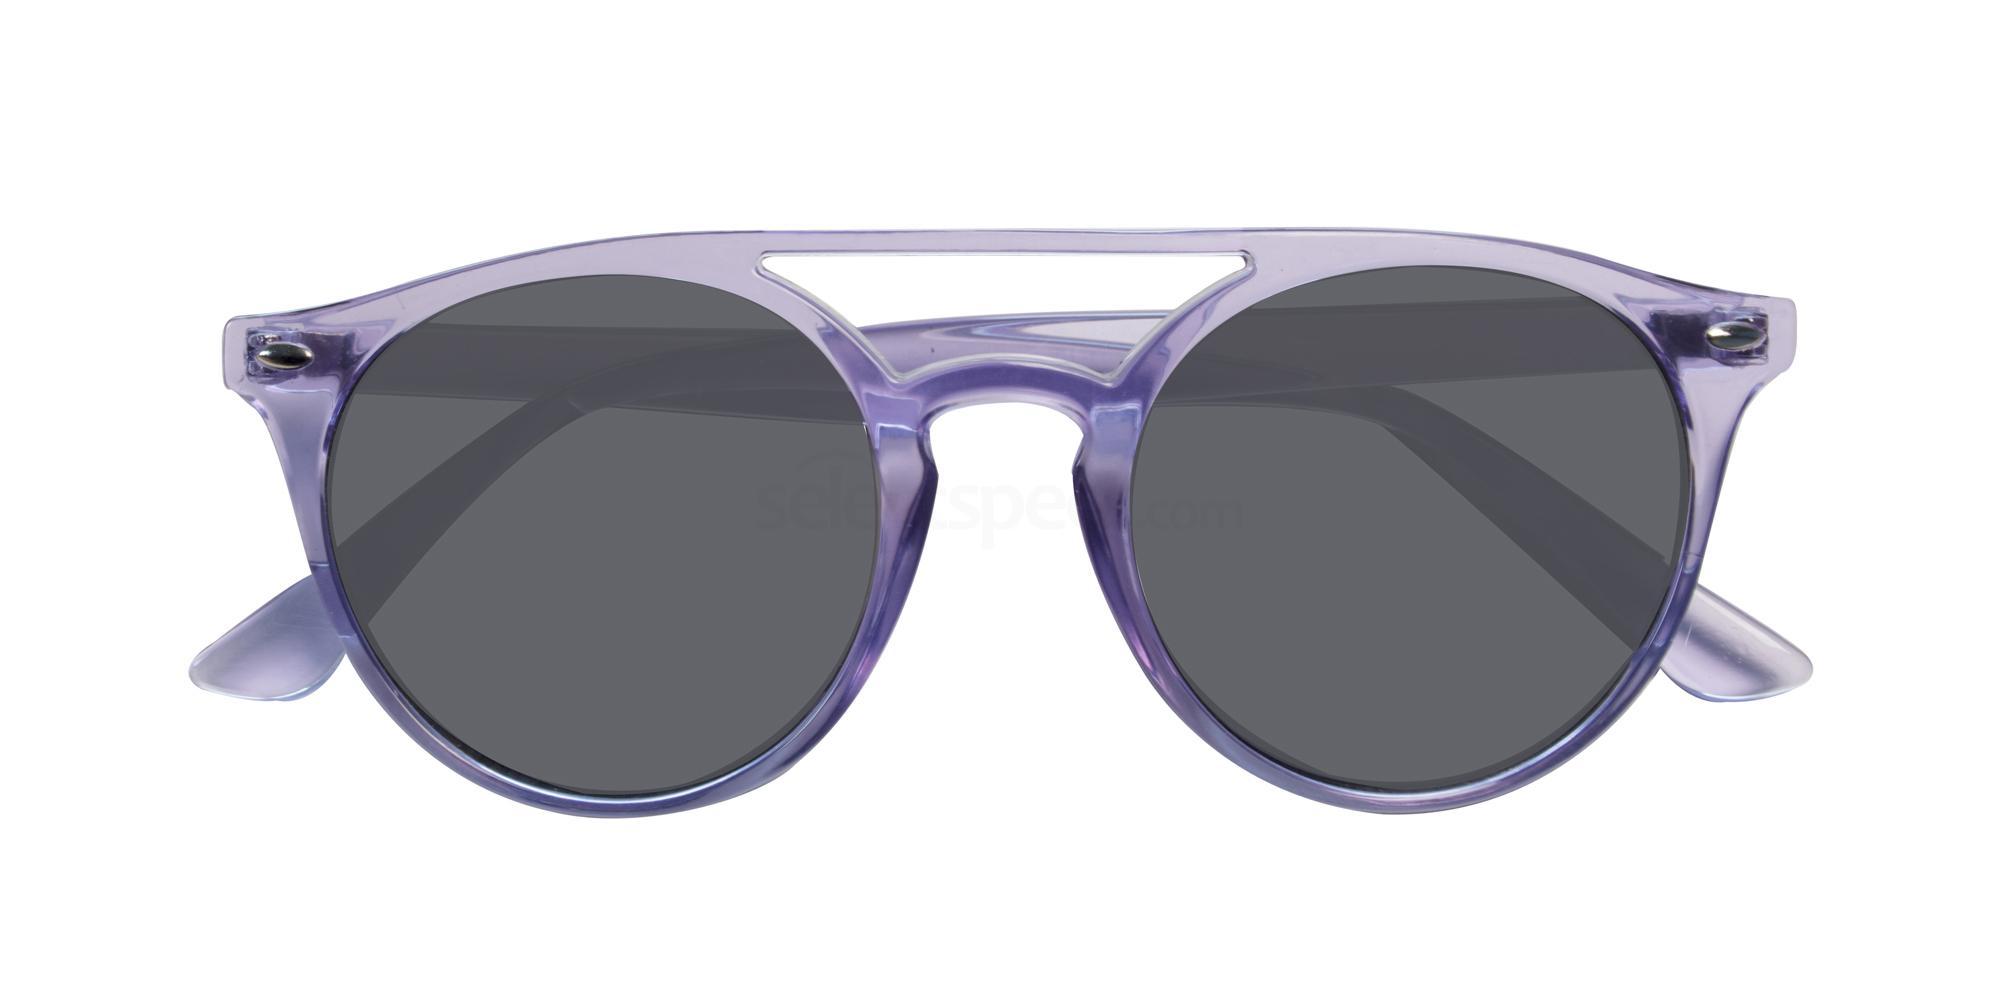 Purple Clear Bobby Sunglasses, Croon